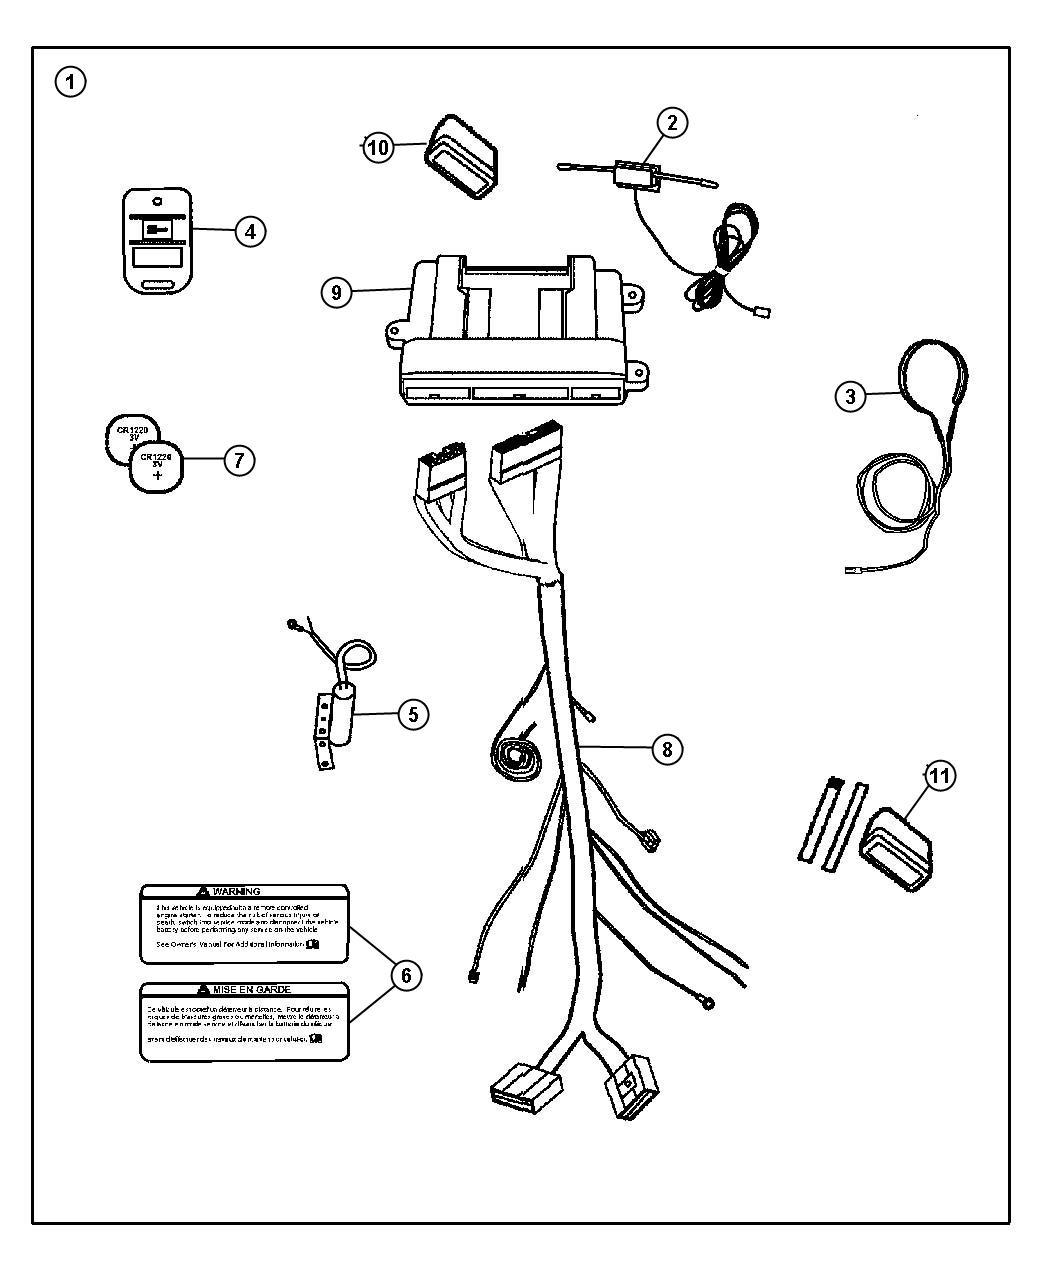 Remote Start Diagram